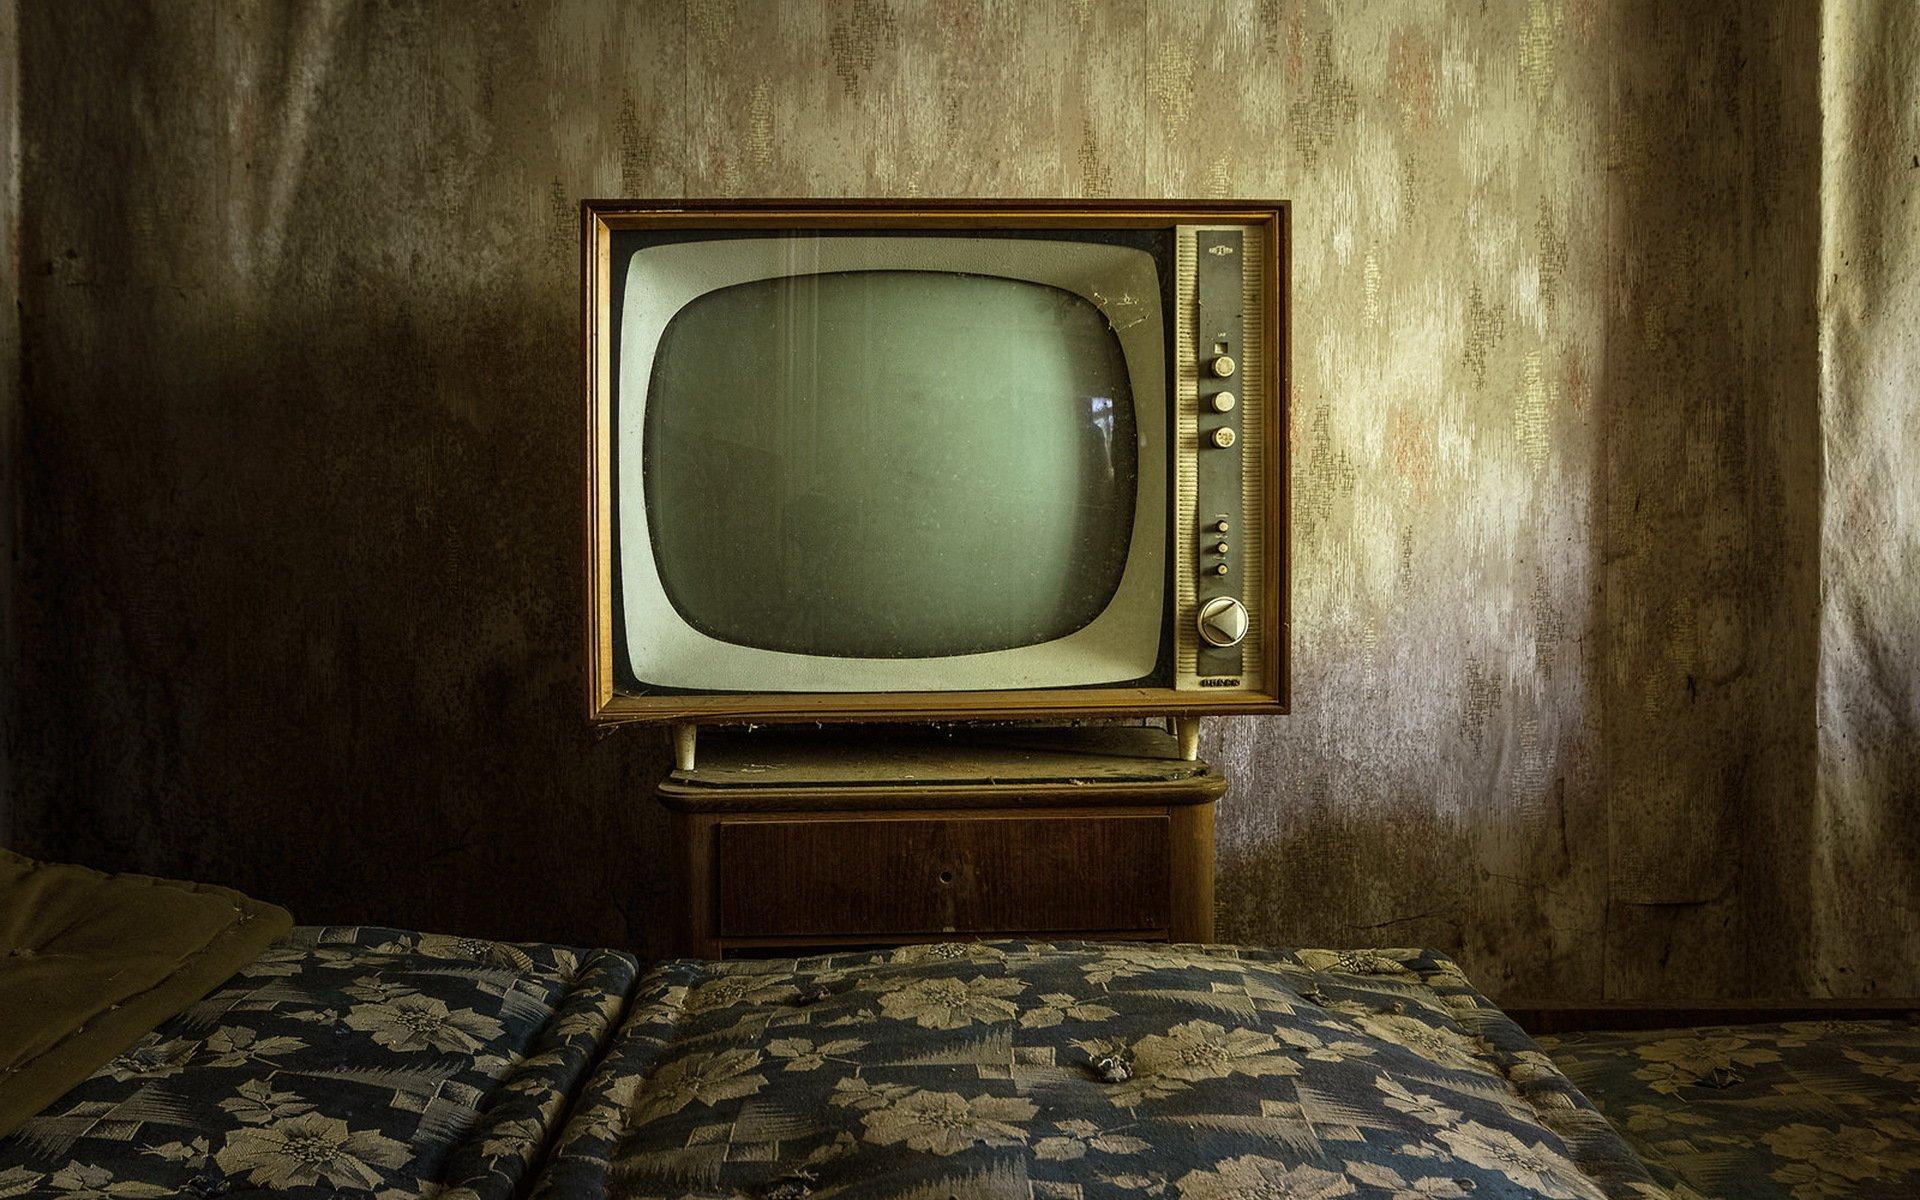 Телевизор картинки на фоне